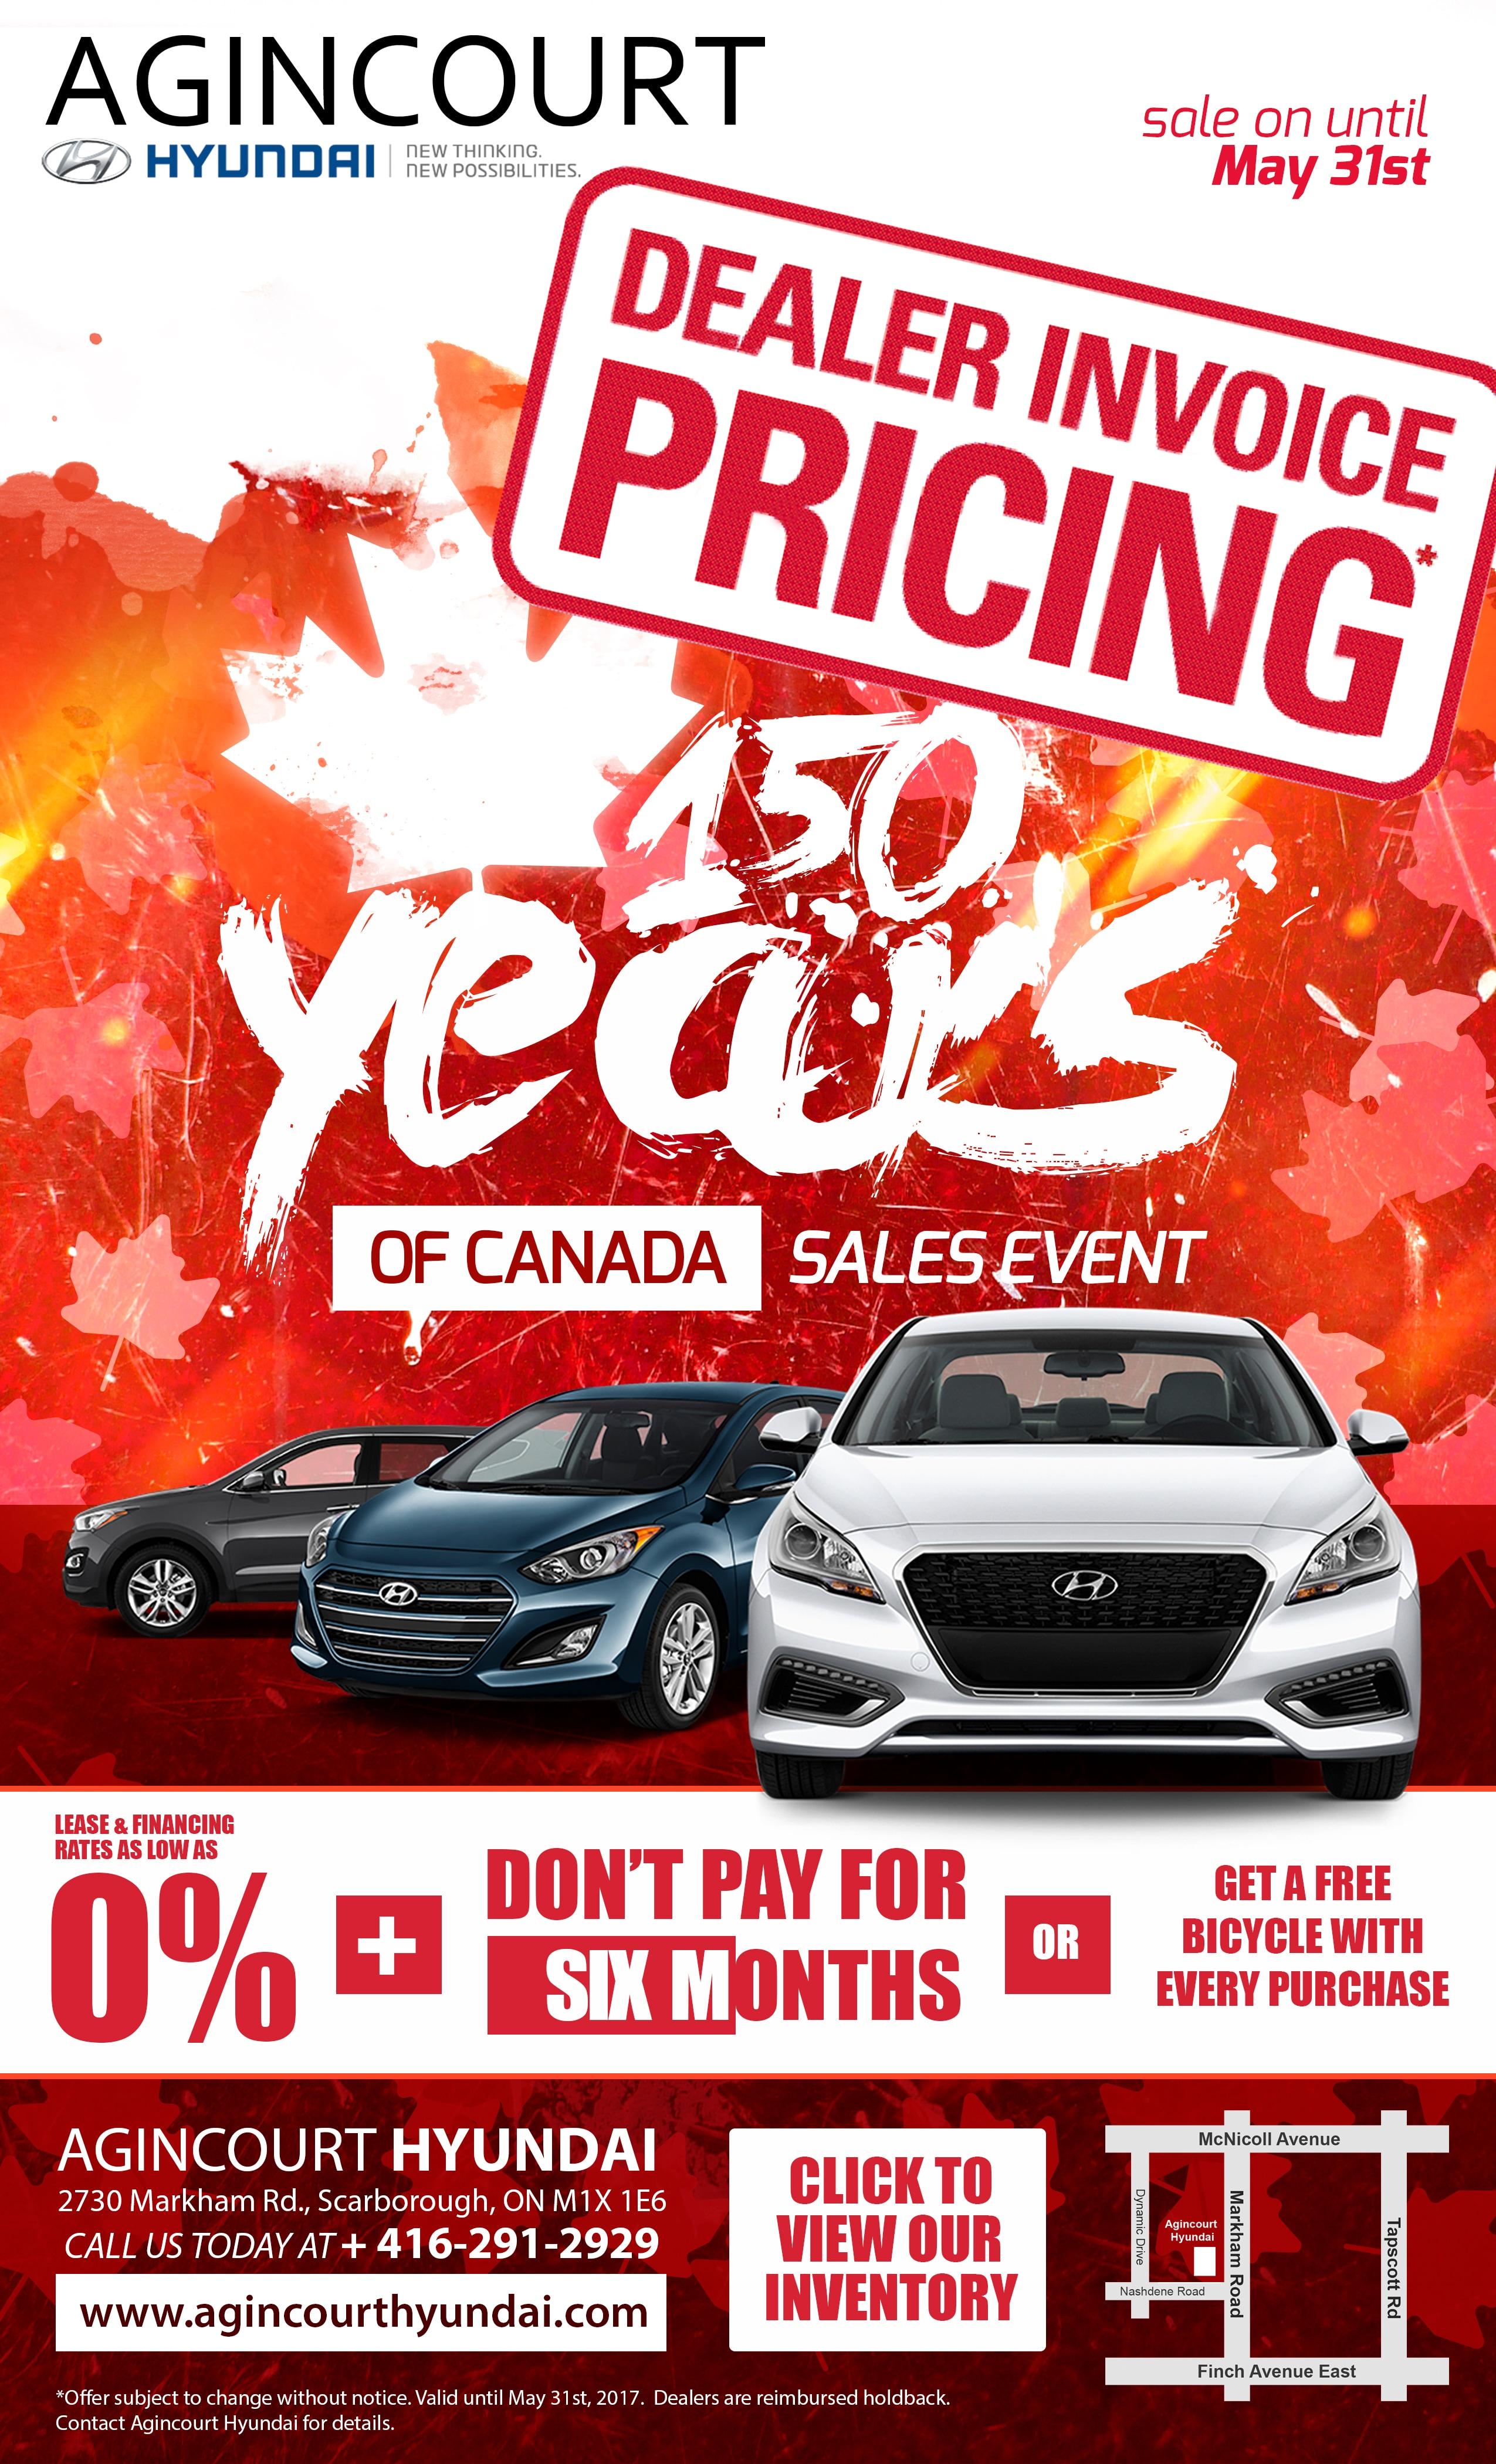 Years Of Canada At Agincourt Hyundai Dealer Invoice Pricing - Hyundai tucson invoice